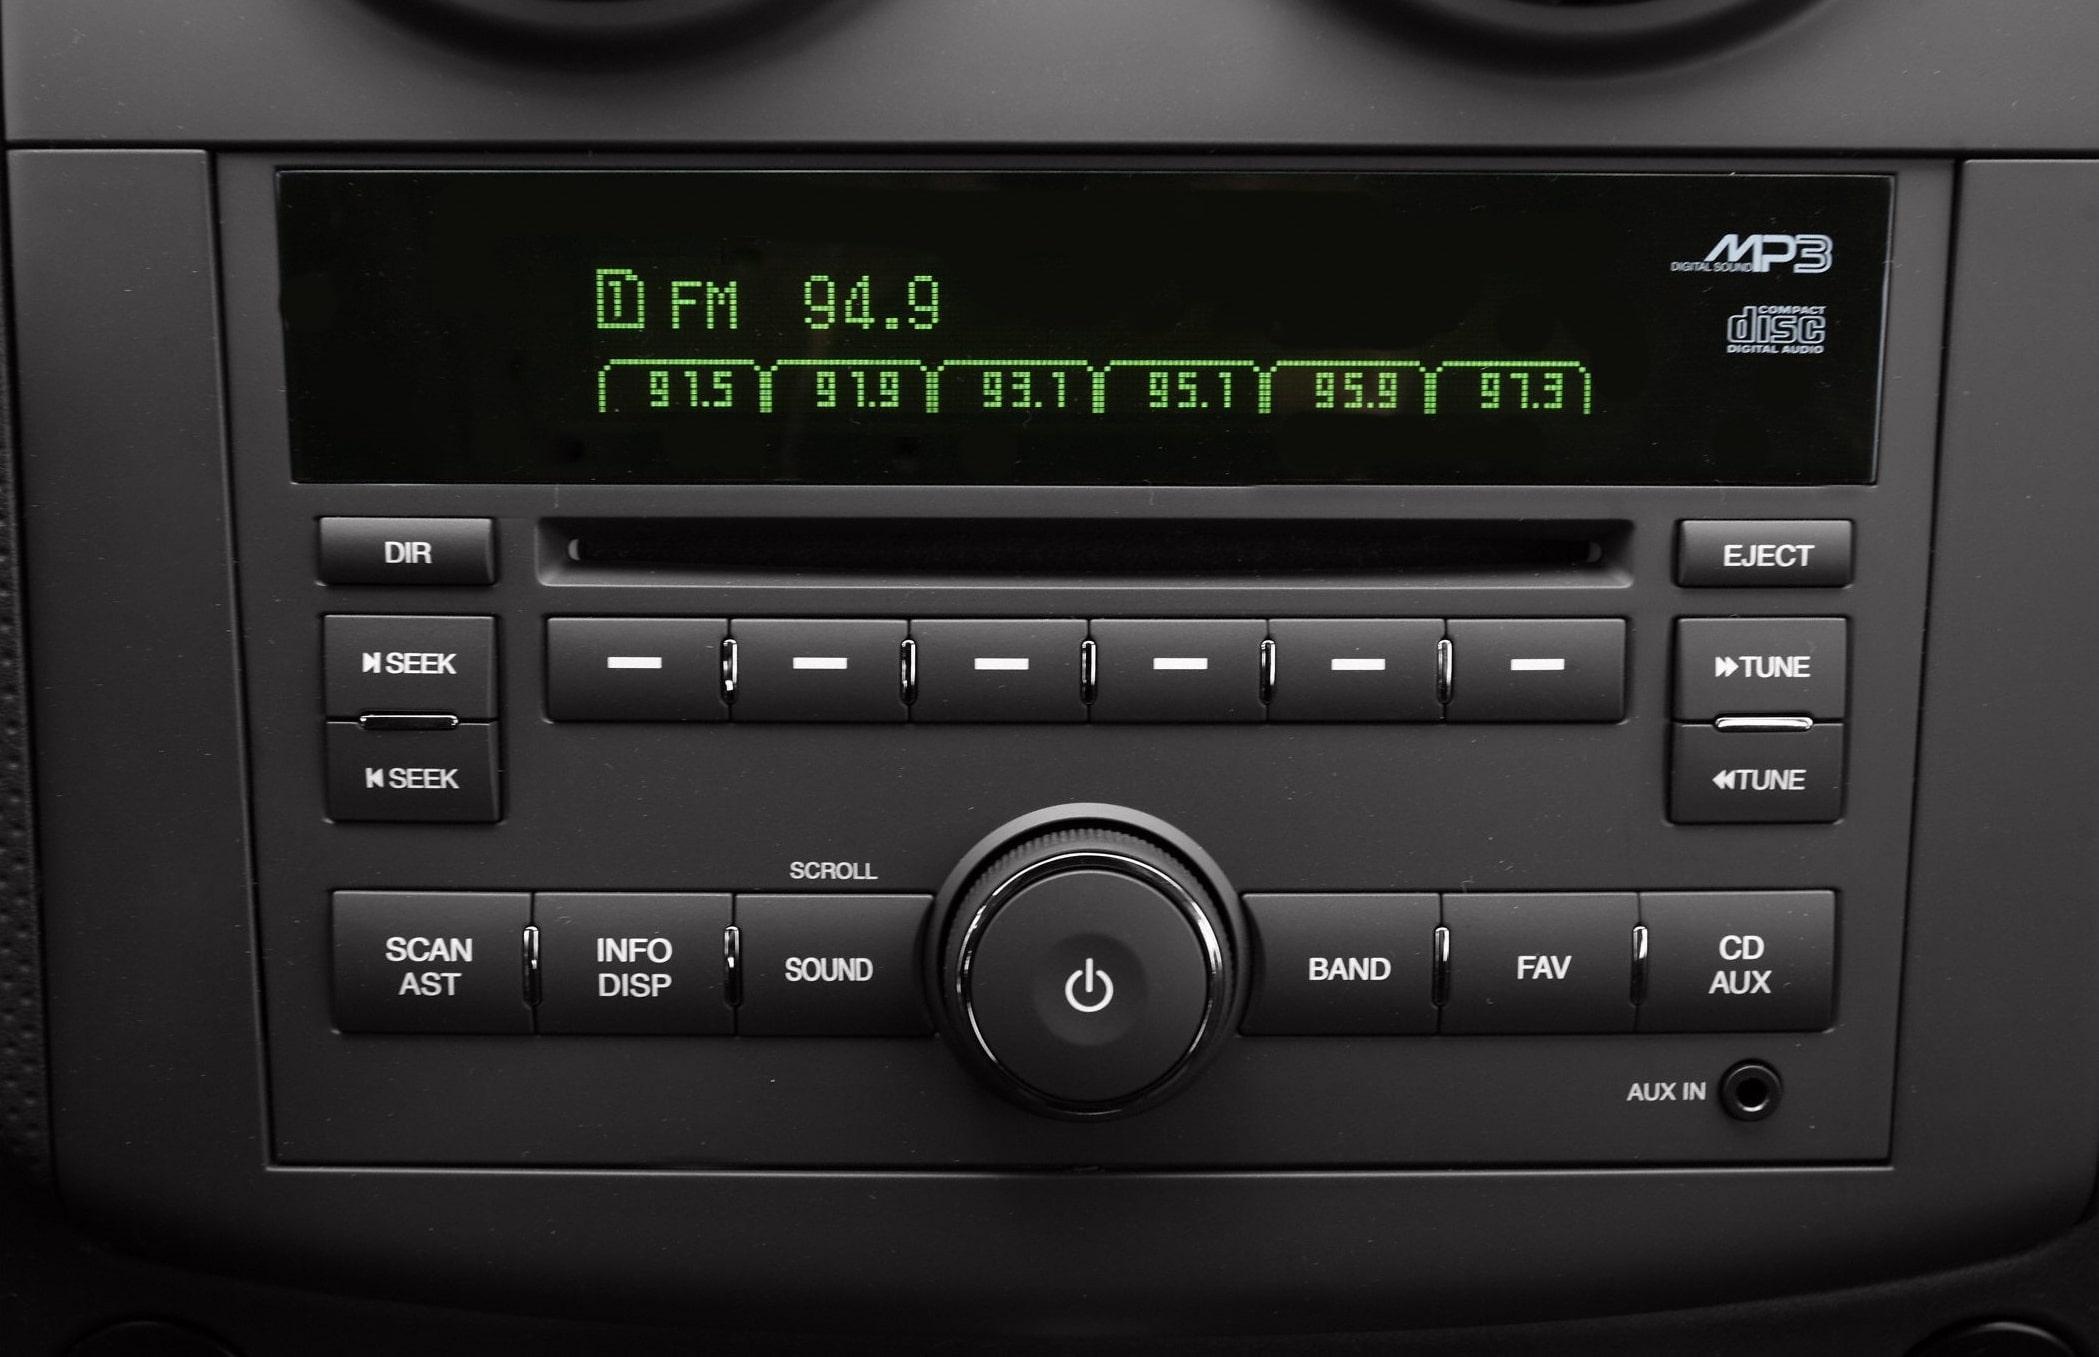 Chevrolet Aveo Radio Code Generator Software Free Download